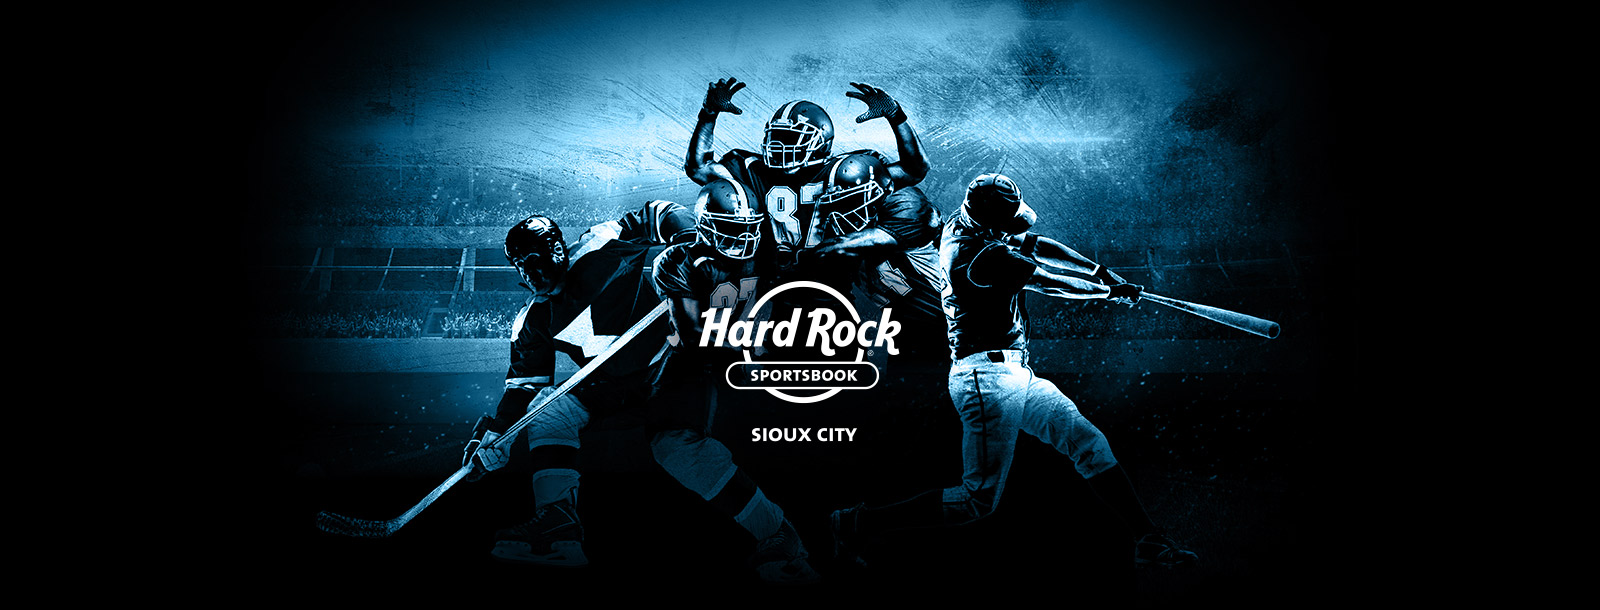 sports betting hardrock